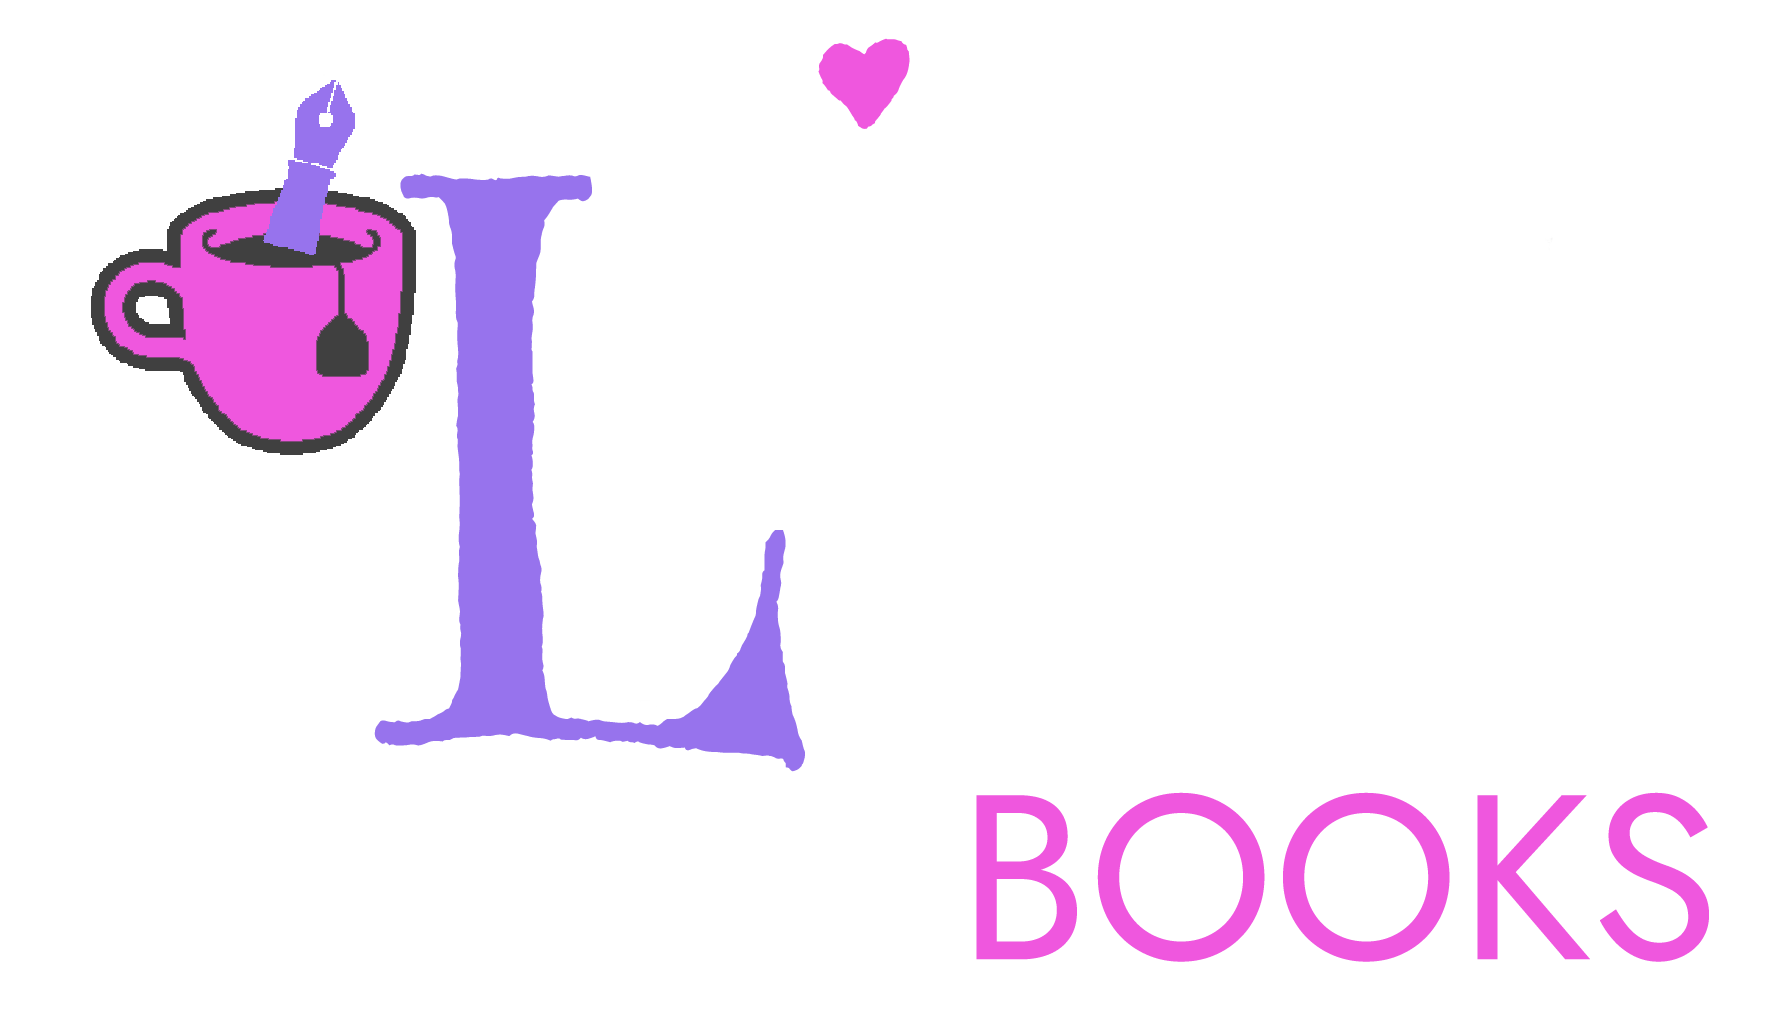 Lainey Delaroque – Author